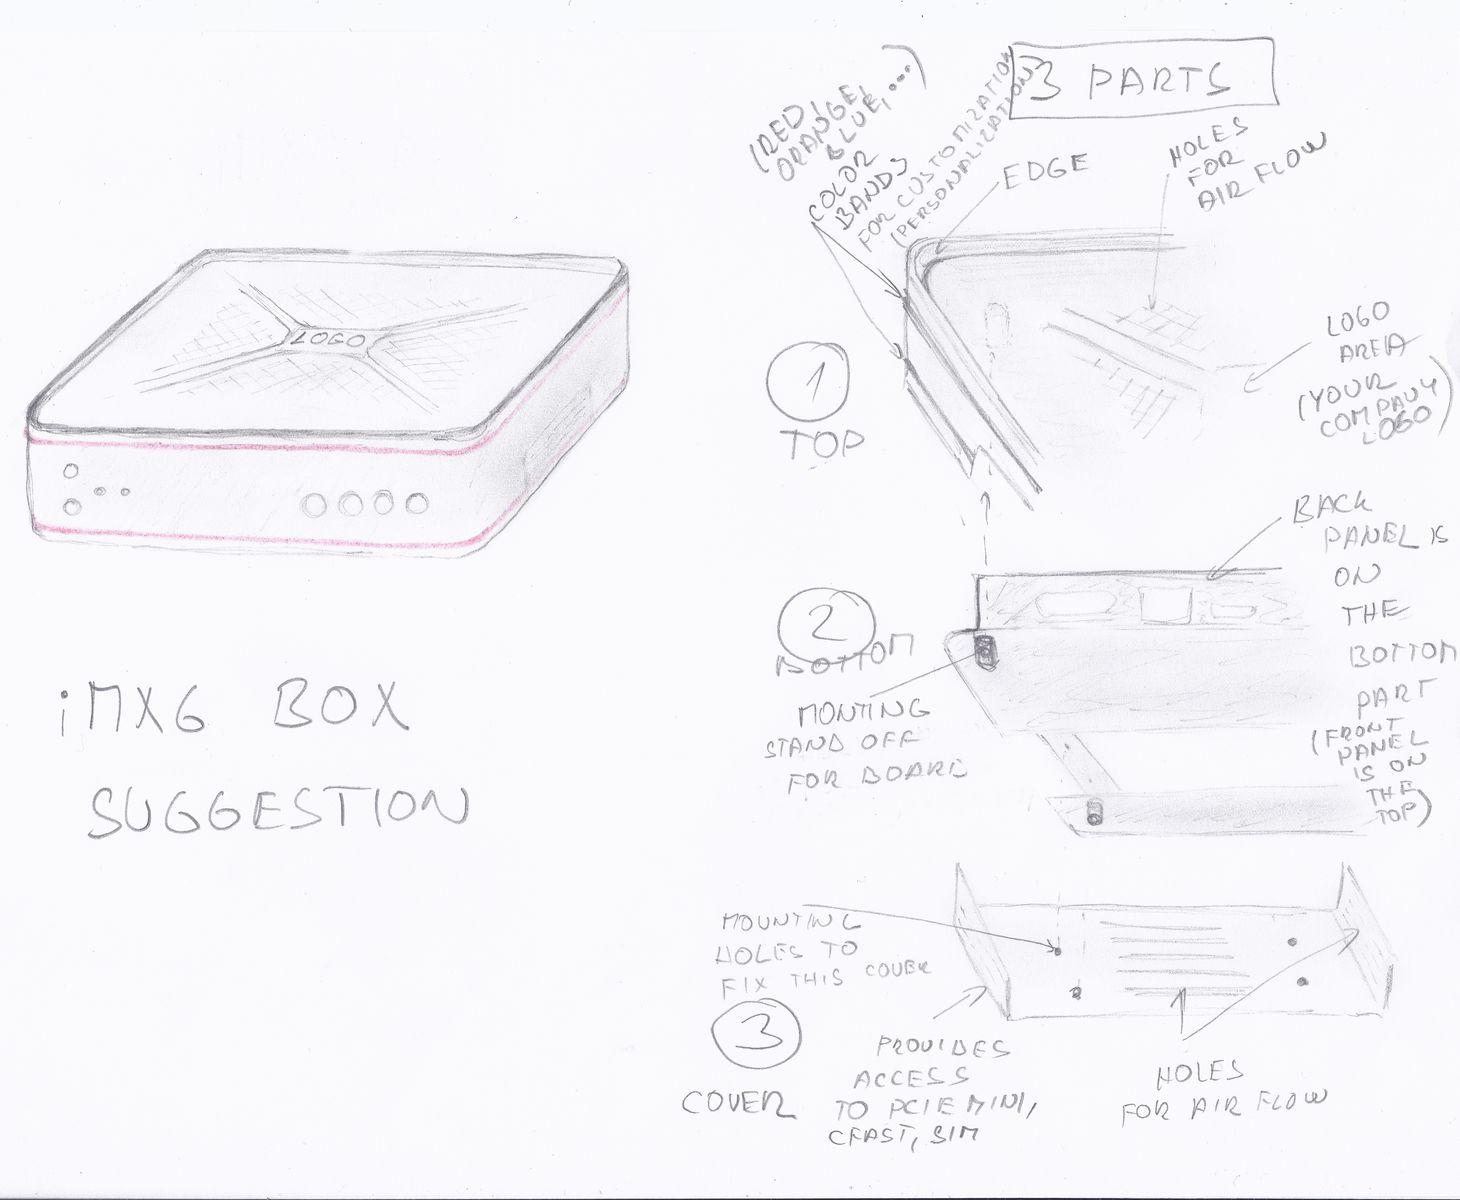 iMX6 Rex Box Suggestion